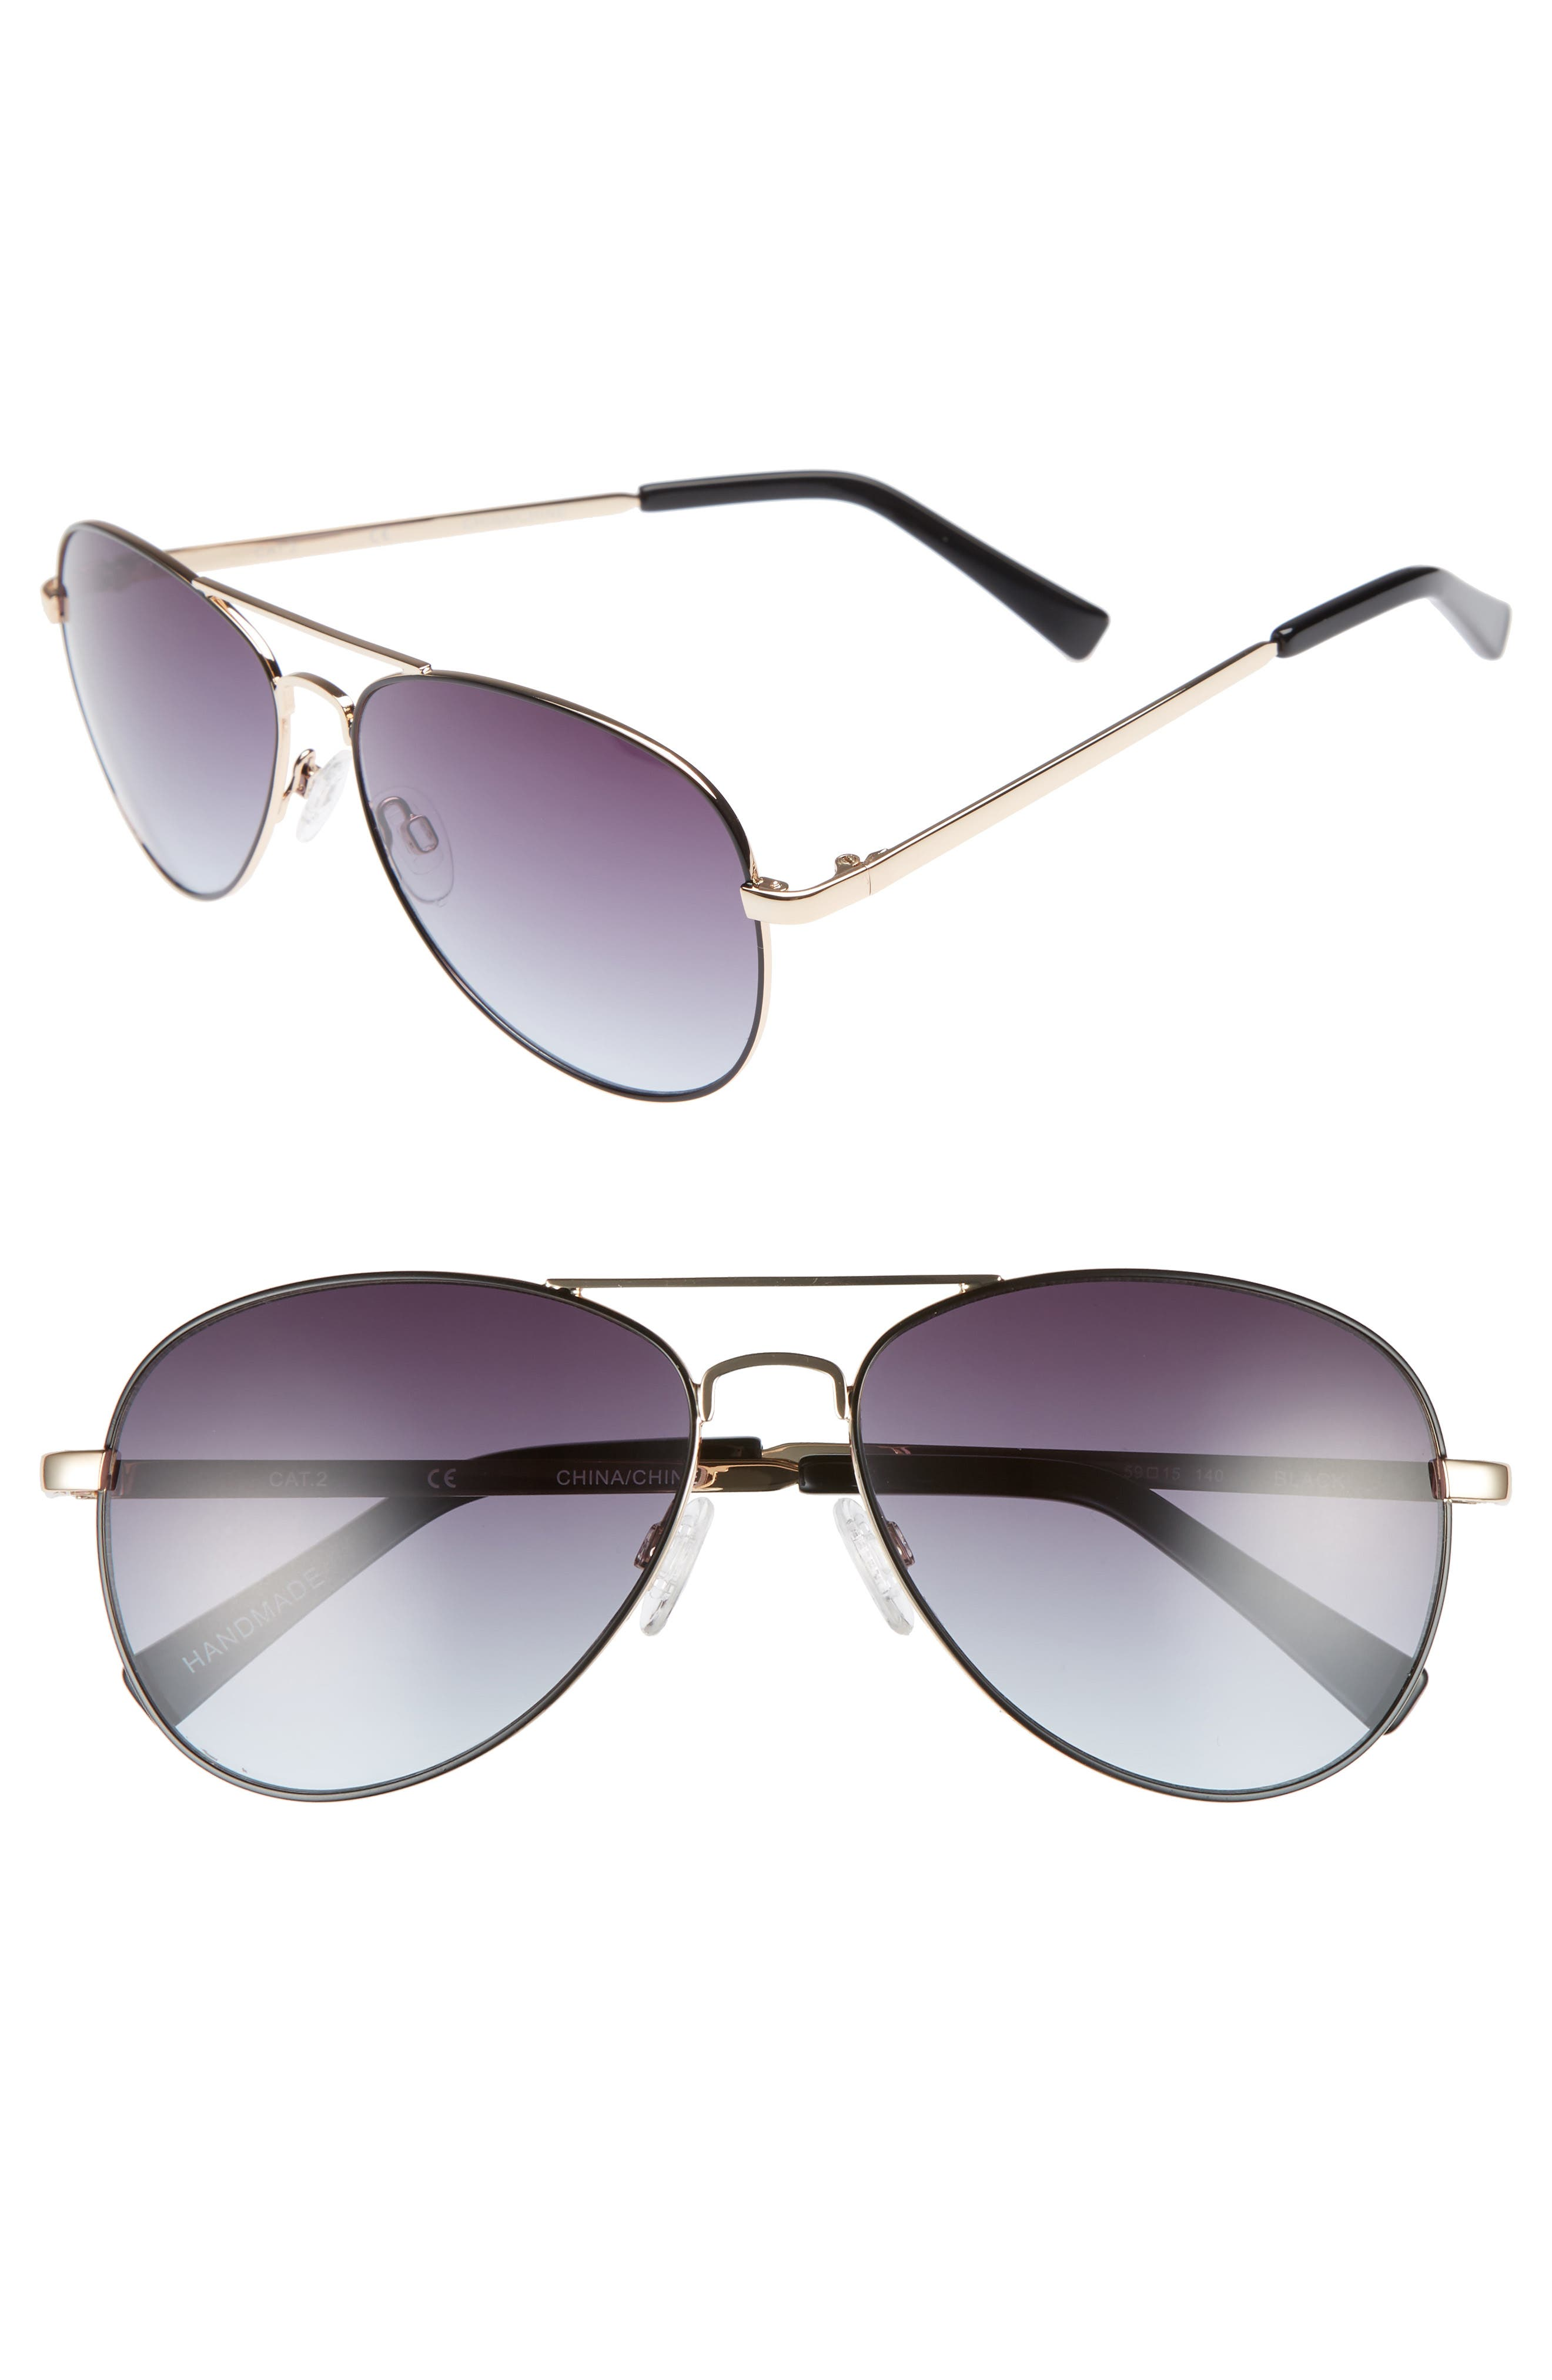 Alibi 59mm Metal Aviator Sunglasses,                             Main thumbnail 1, color,                             Gold- Black Epoxy